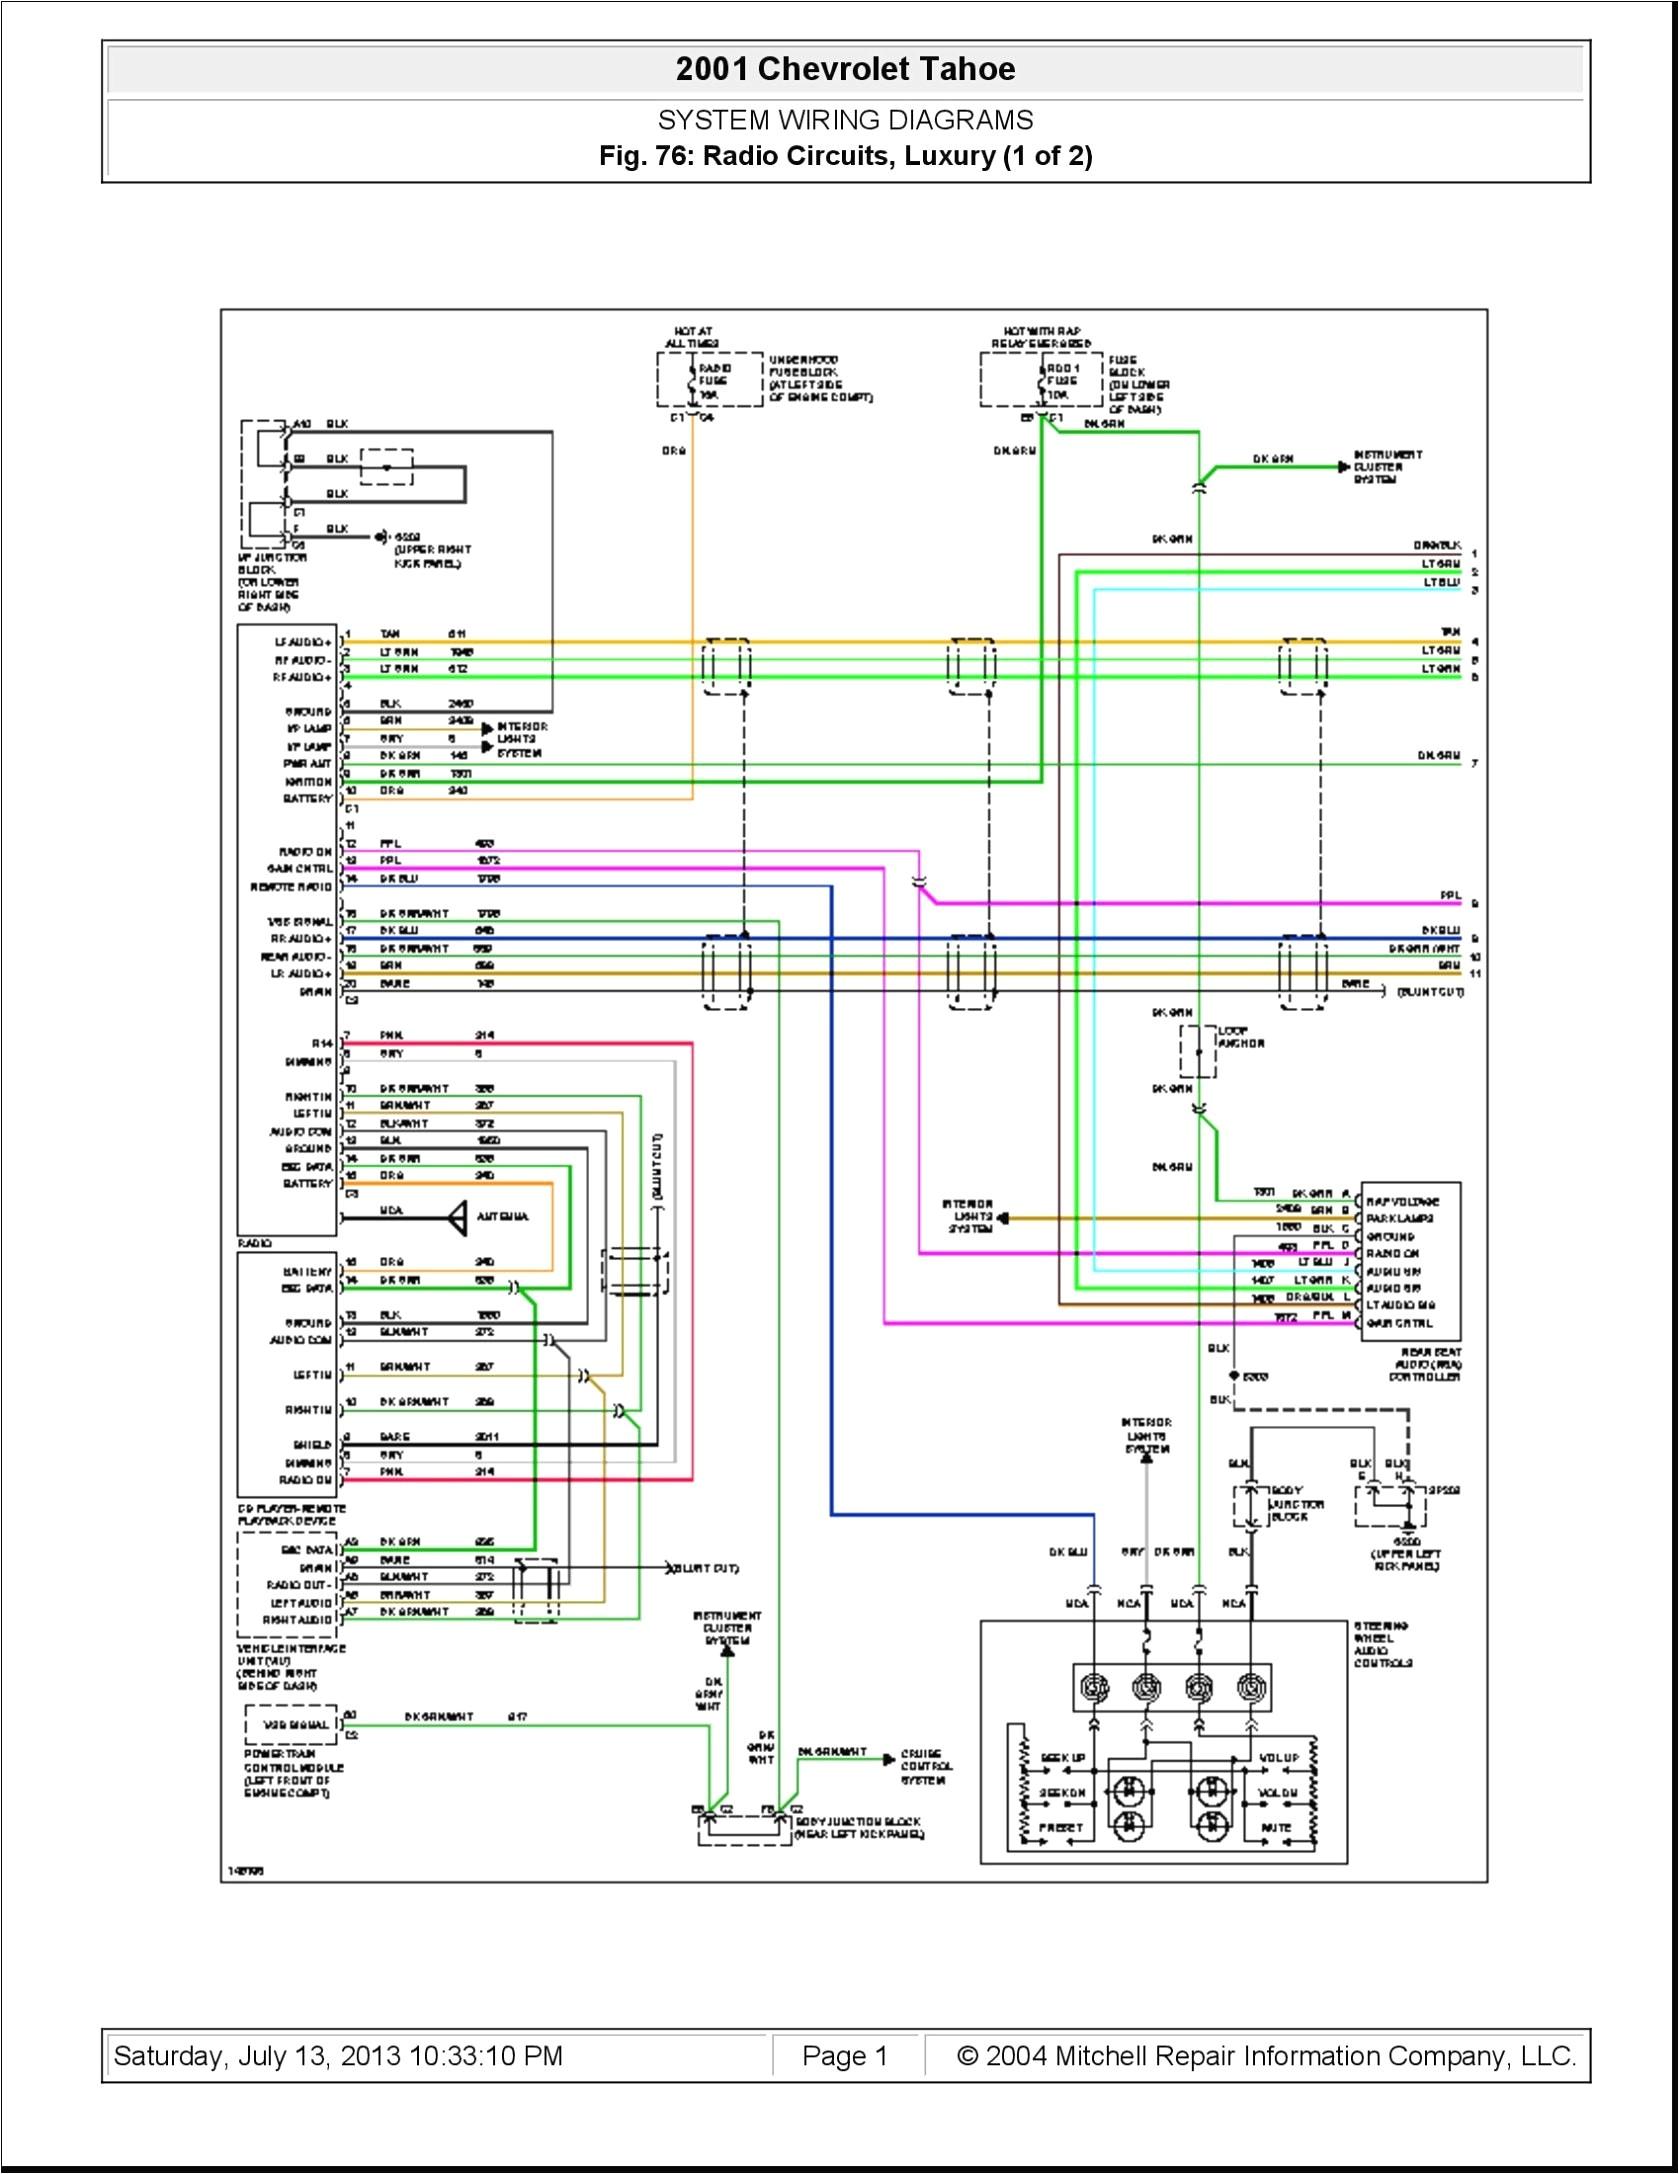 2008 Chevy Silverado Wiring Diagram 2012 Chevy Power Seat Wiring Wiring Diagram Post